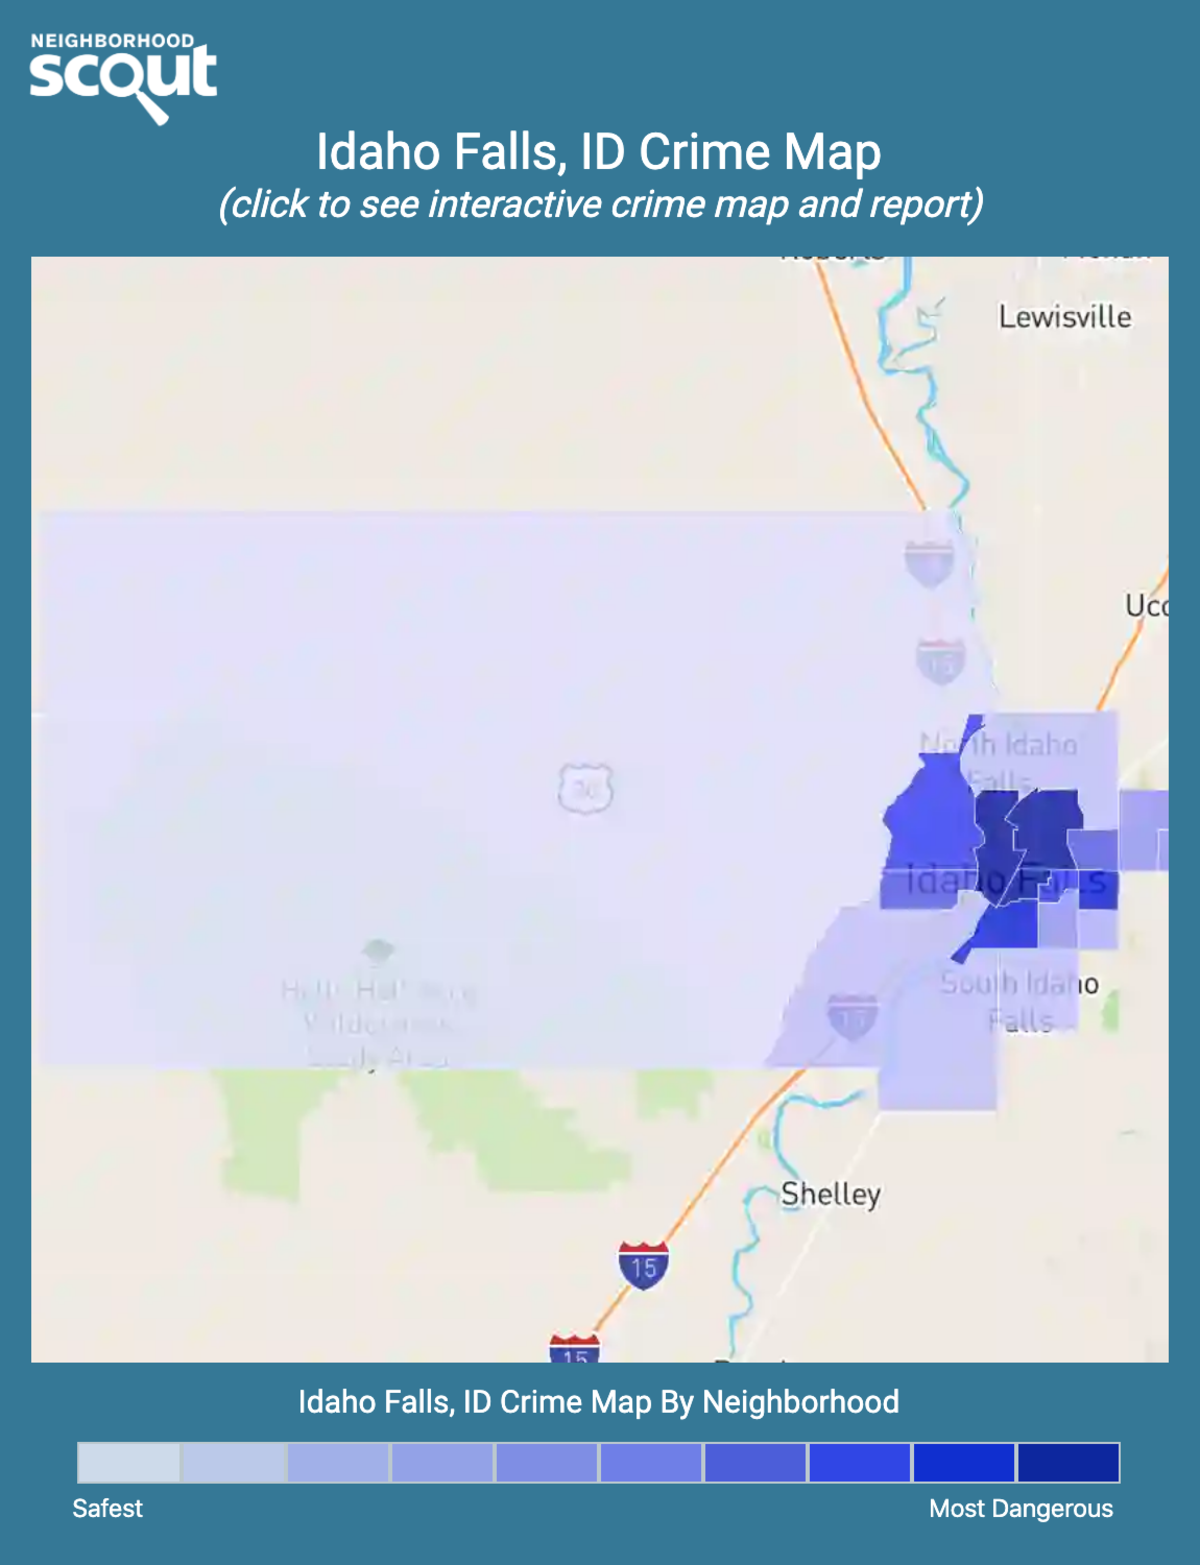 Idaho Falls, Idaho crime map